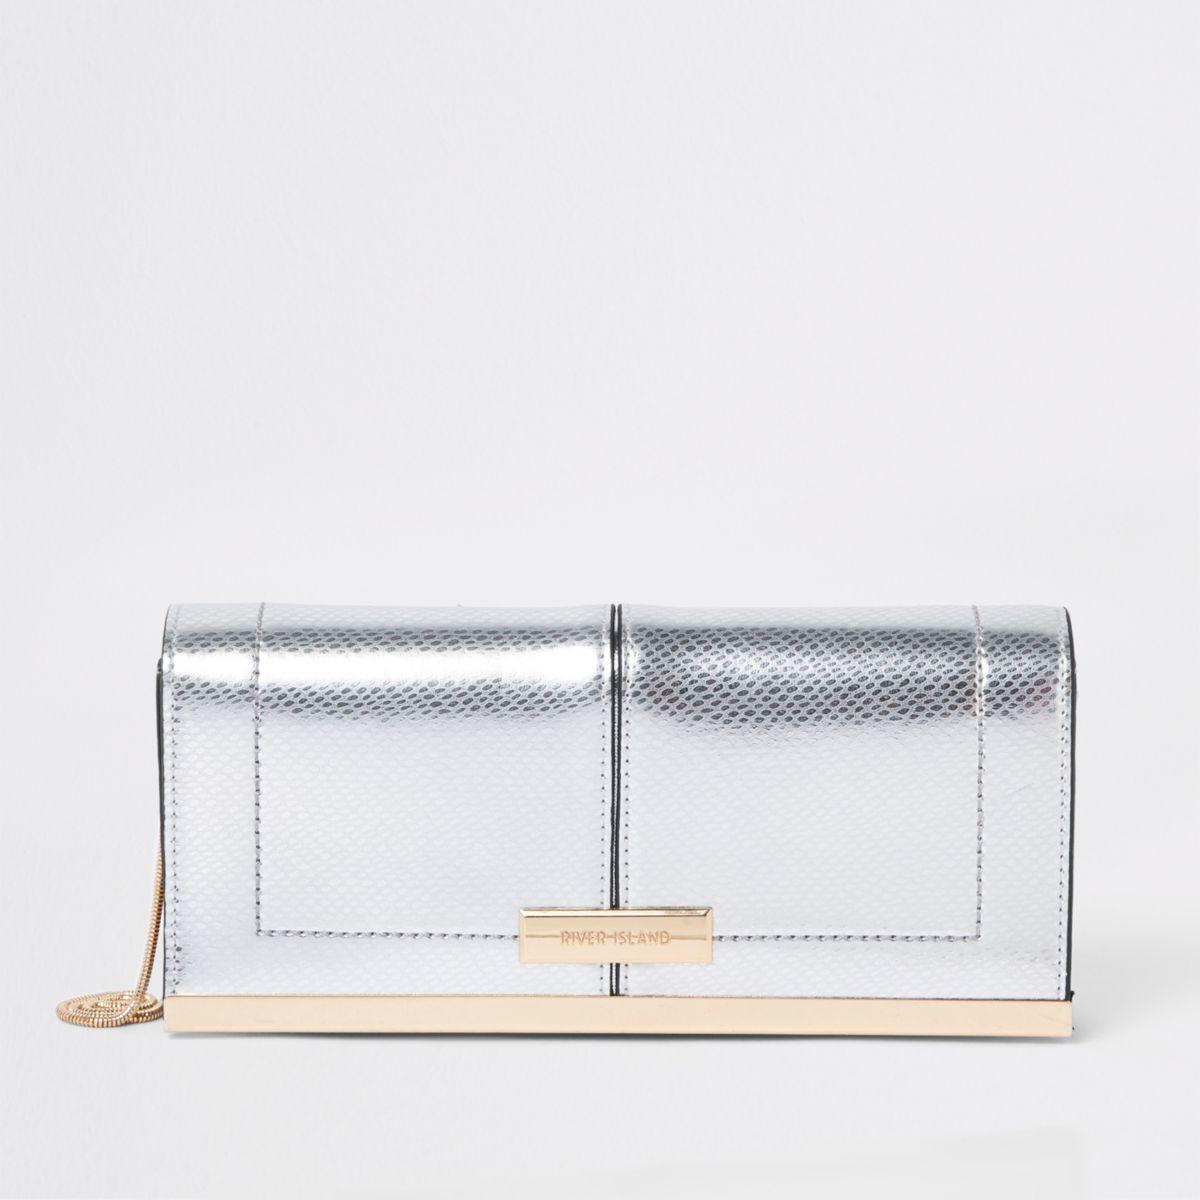 Silver baguette clutch bag